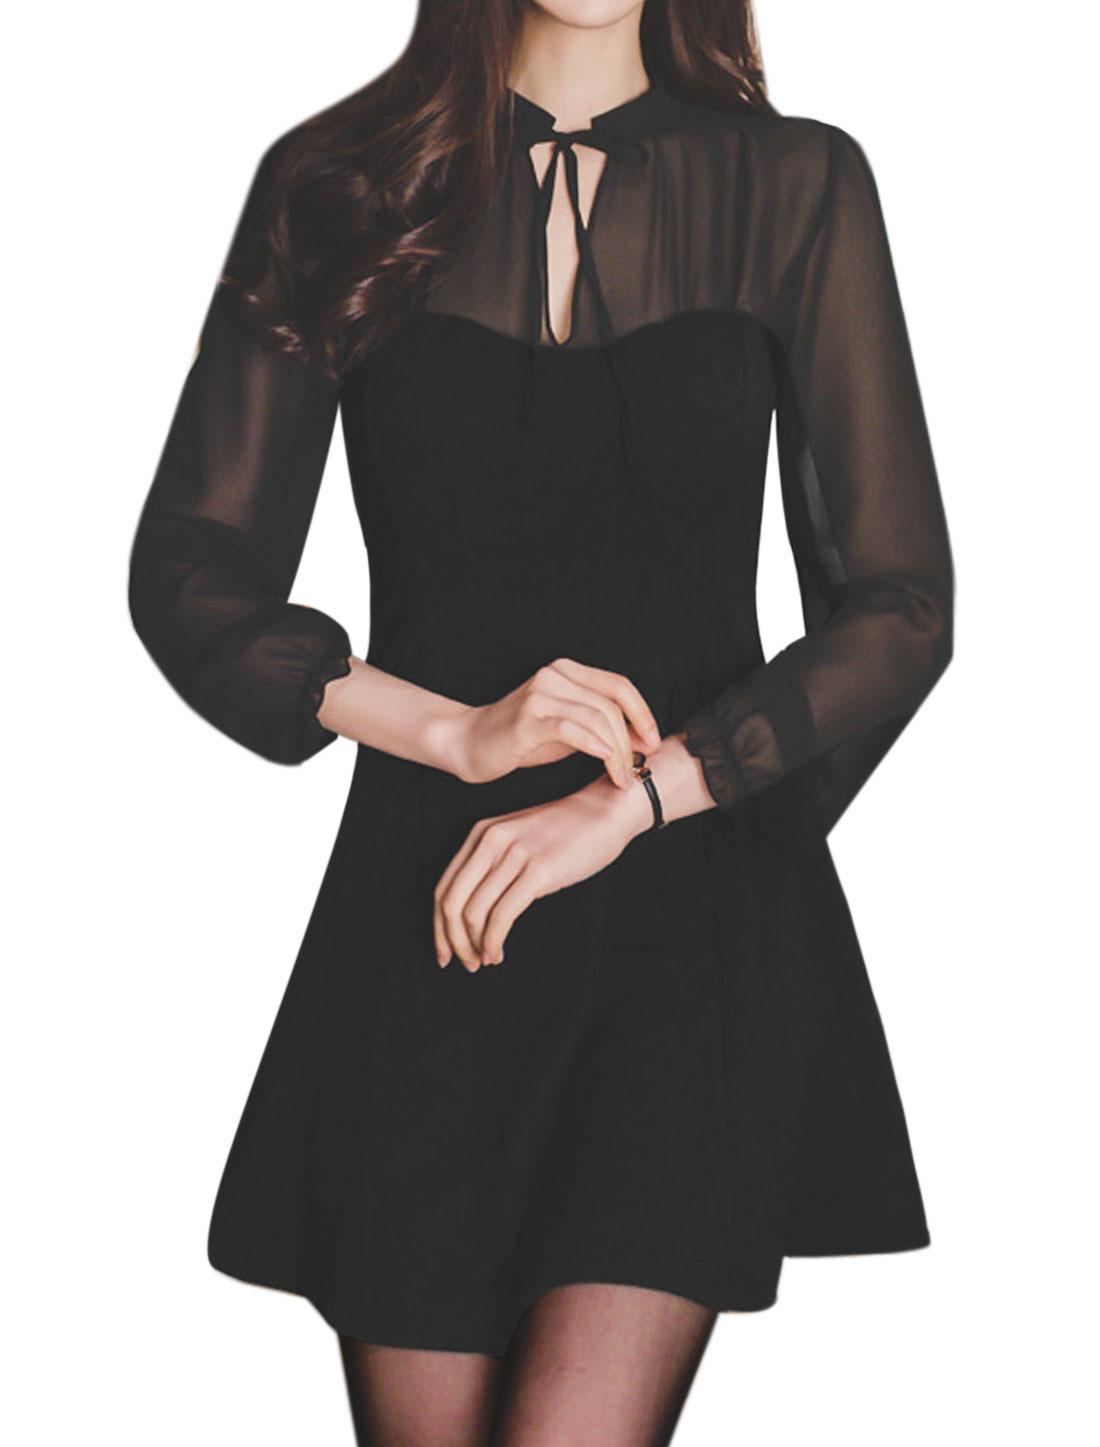 Ladies Self Tie Front Chiffon Panel A Line Dress Black M